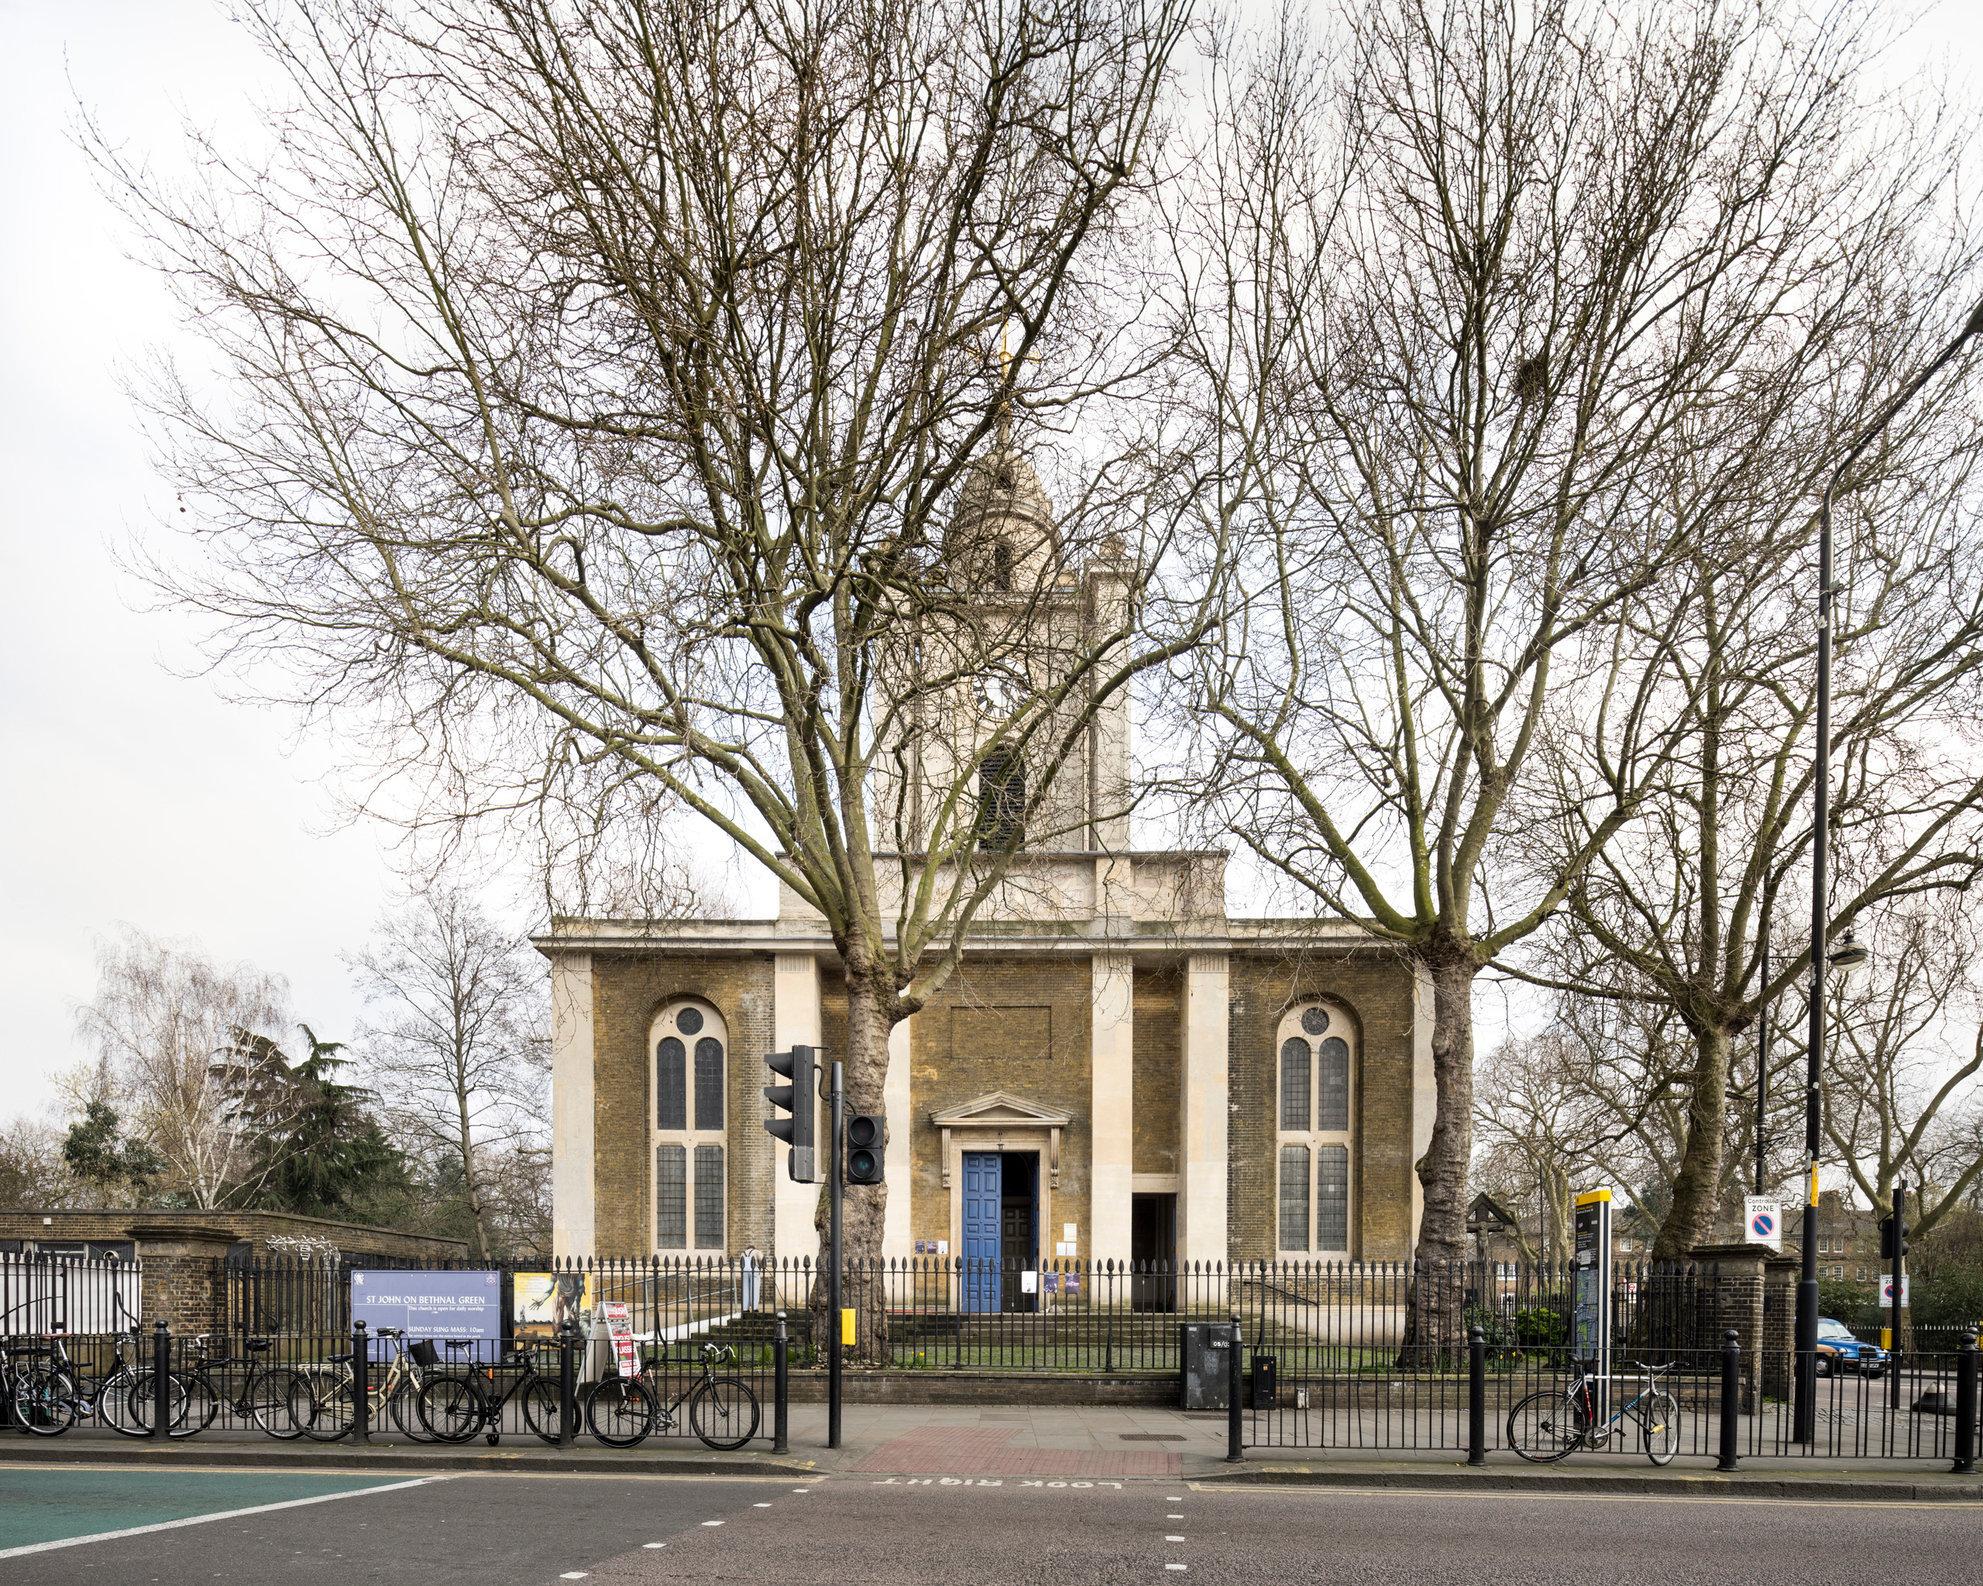 St John's, Bethnal Green. Sir John Soane